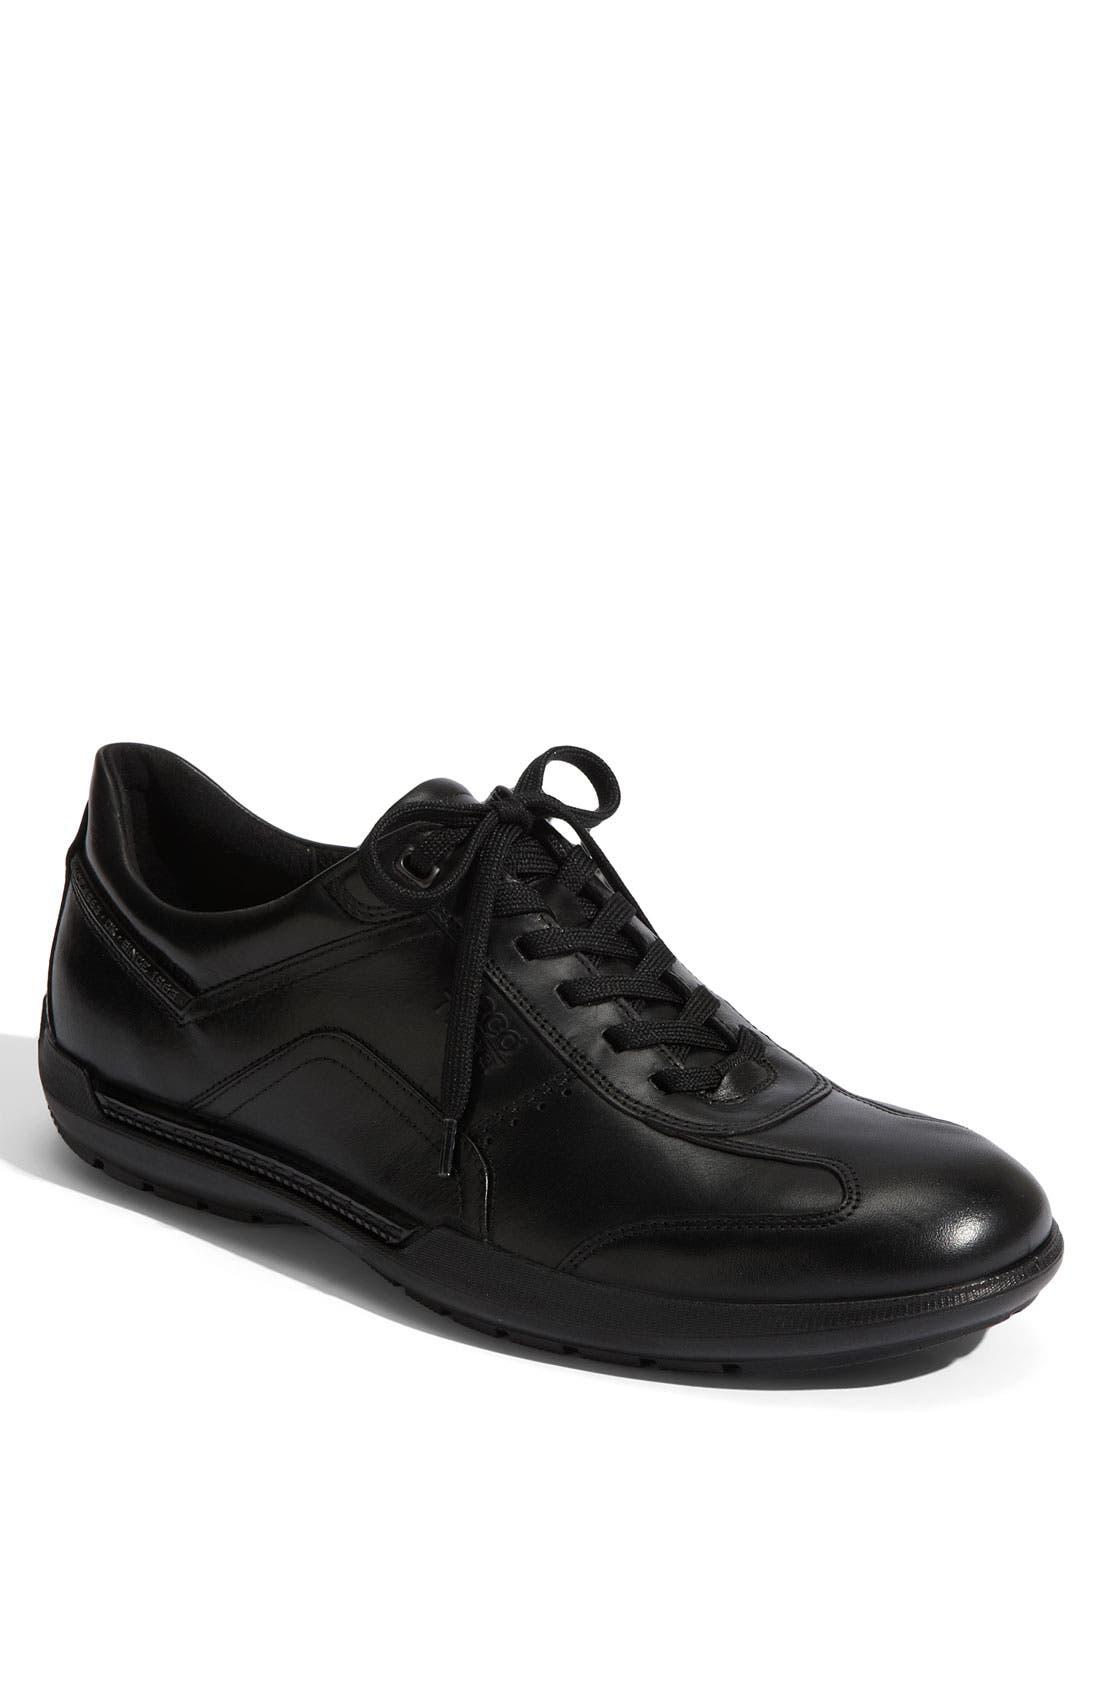 Alternate Image 1 Selected - ECCO 'Welt' Sneaker